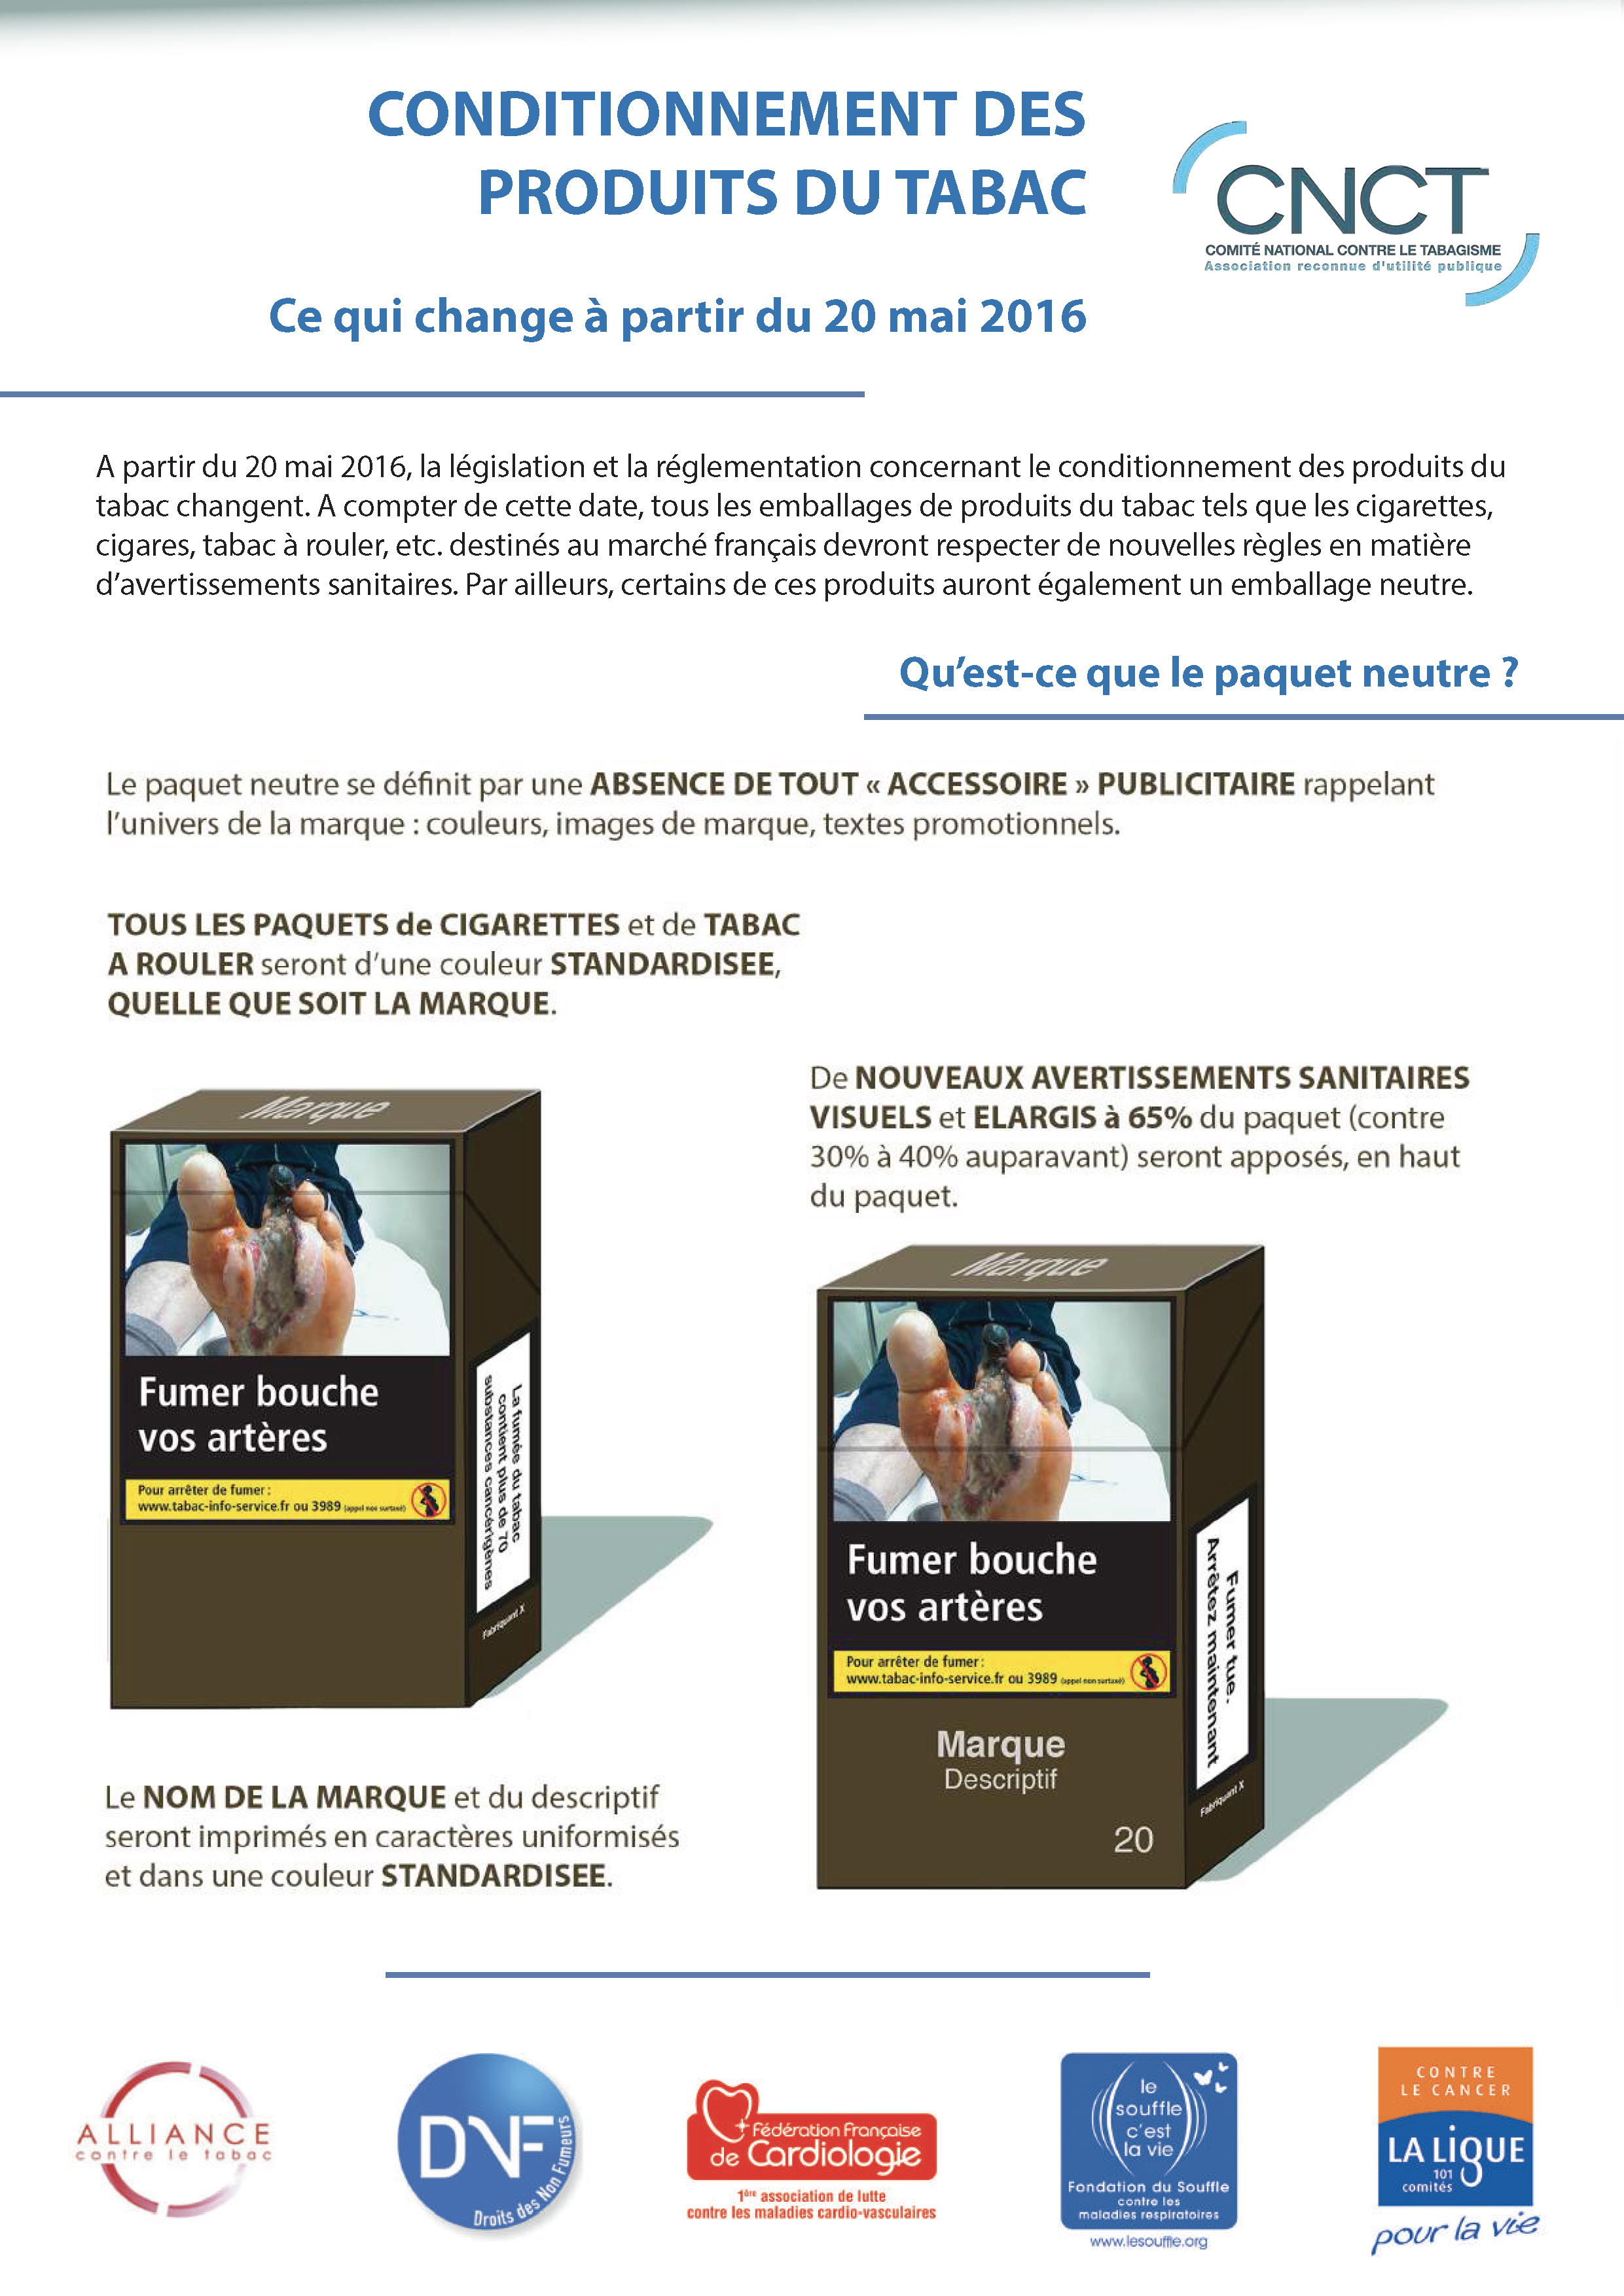 Alliance-DP_journee-mondiale-sans-tabac-avec-annexes-vf-30mai2016_Page_13.jpg